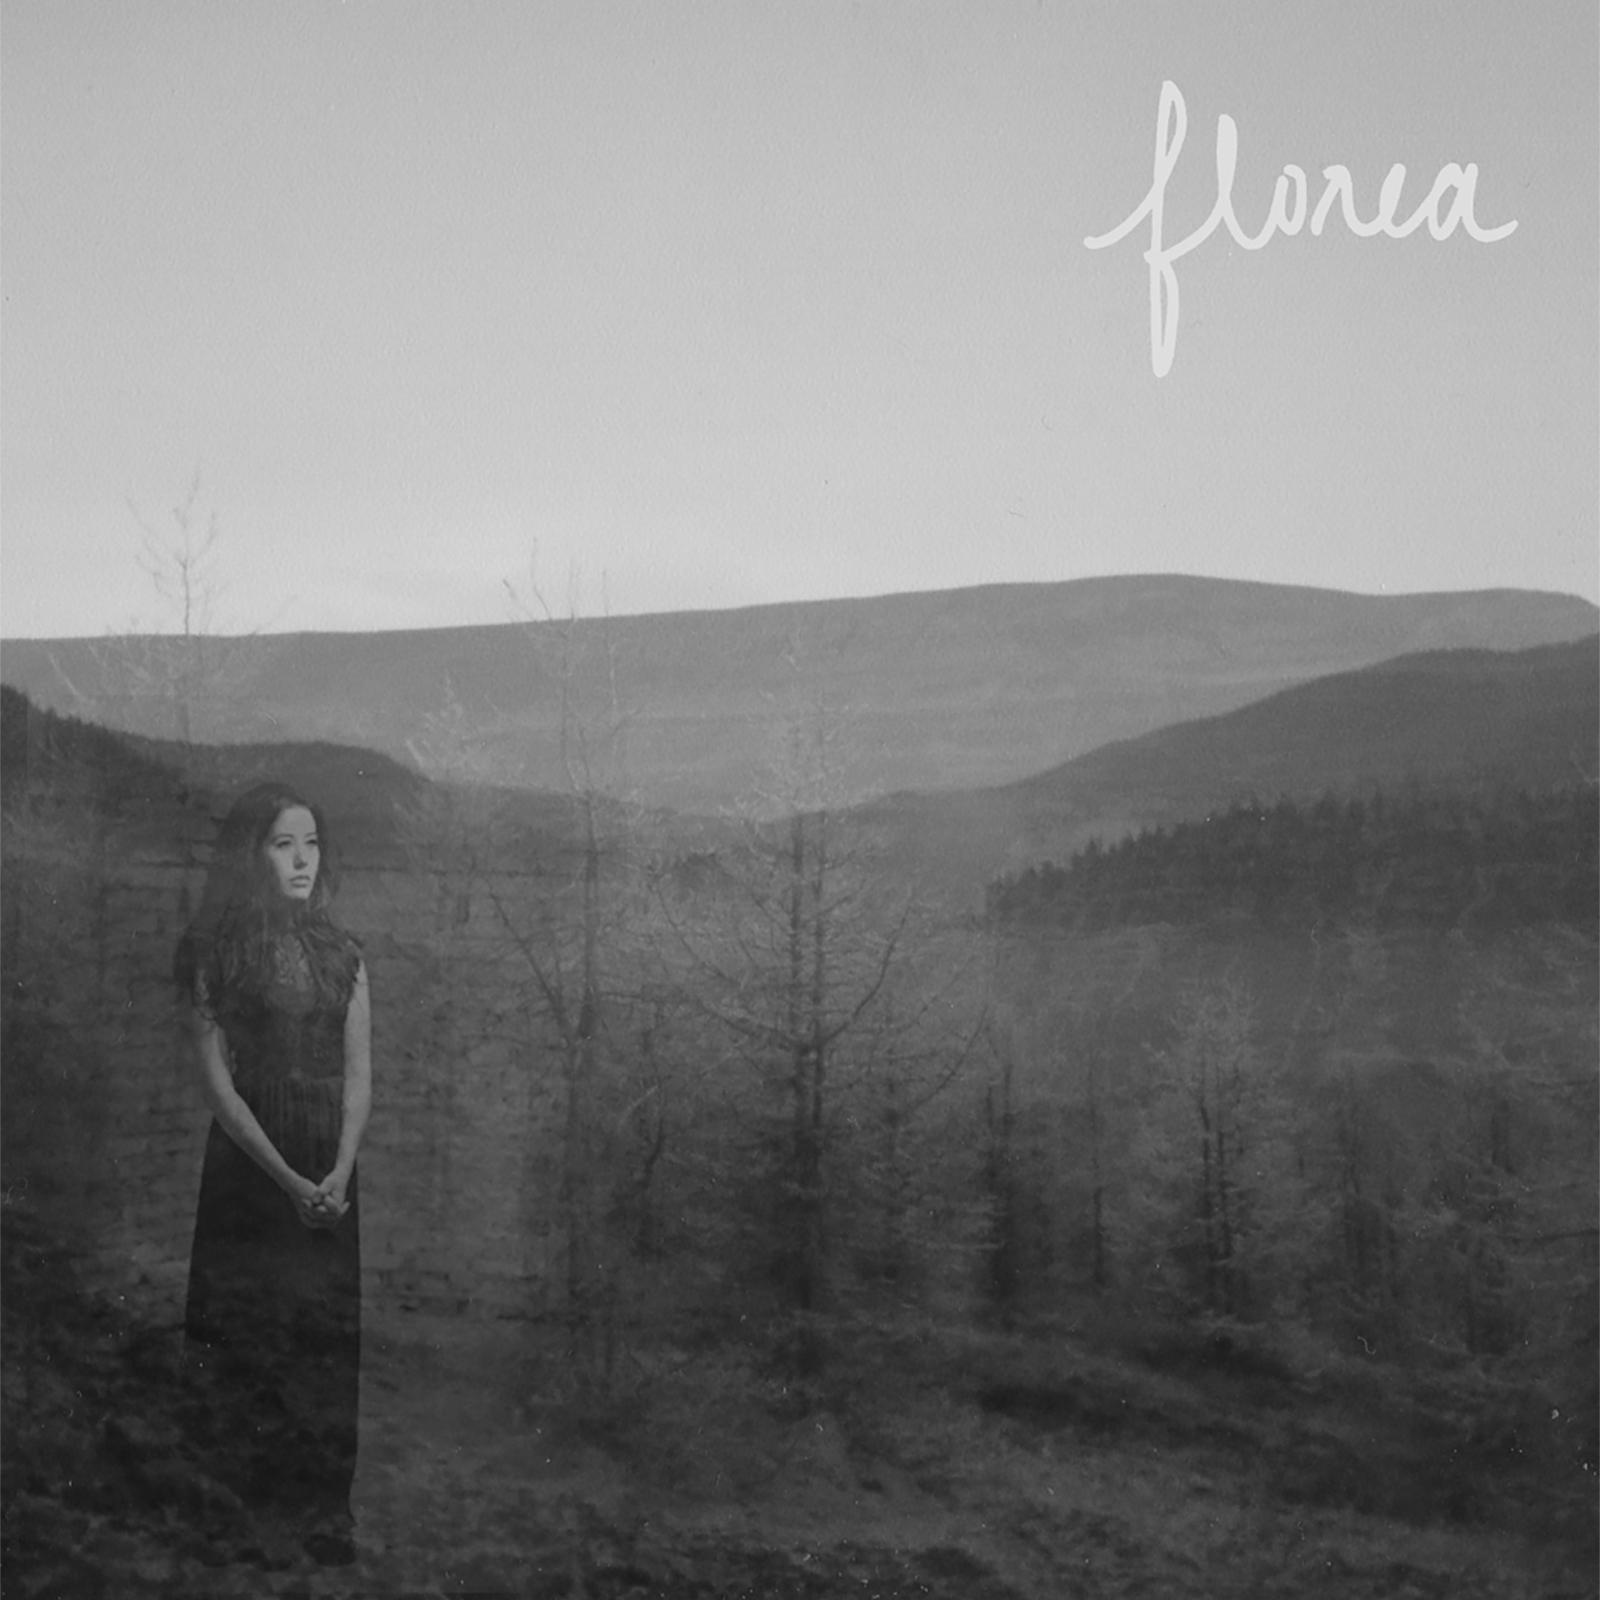 florea_cover_album.jpg